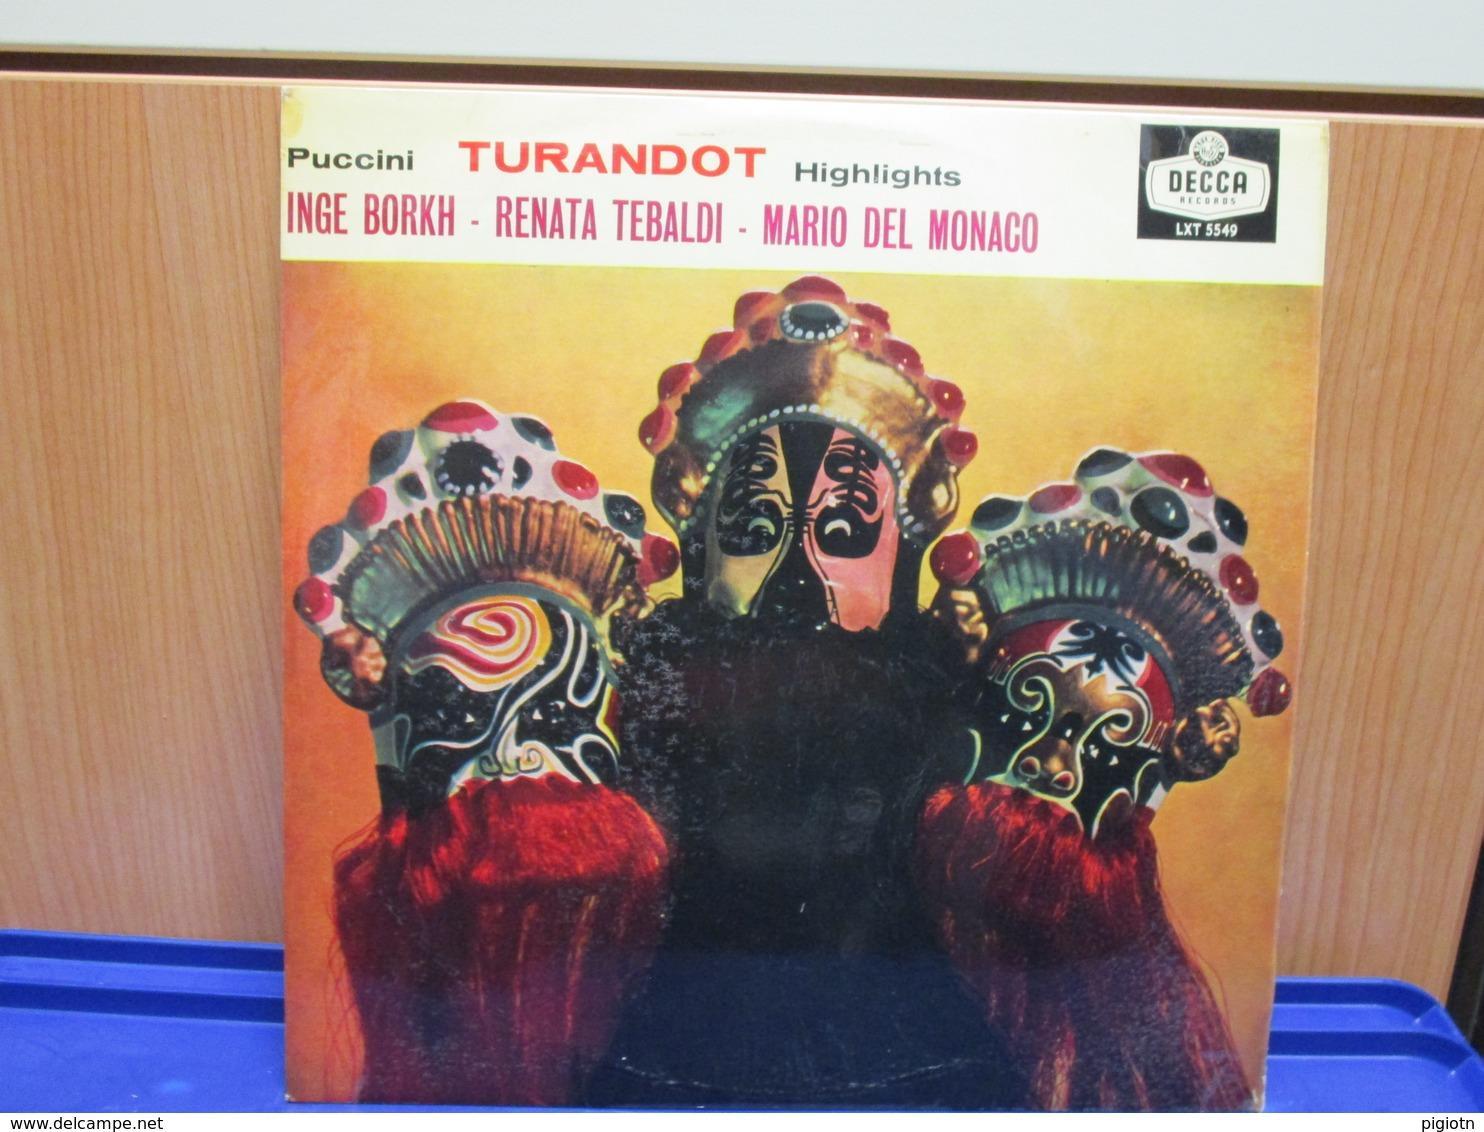 LP052-TURANDOT HIGHLIGHTS - INGE BORKH-RENATA TEBALDI-MARIO DEL MONACO - Oper & Operette